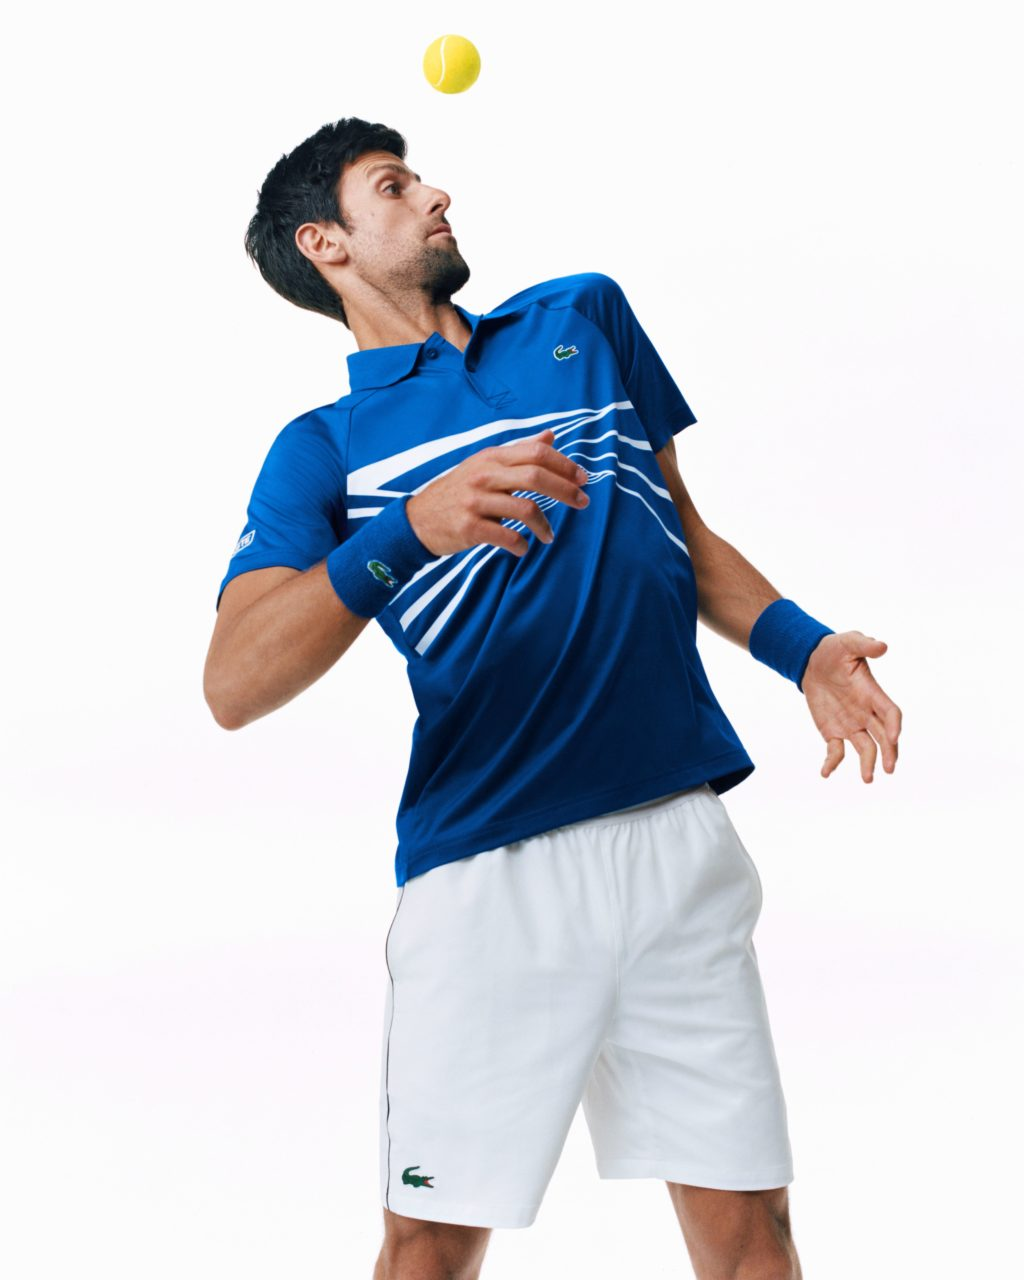 b61bd5a24e Les tenues Lacoste de Novak Djokovic, Pierre-Hugues Herbert, Jérémy ...